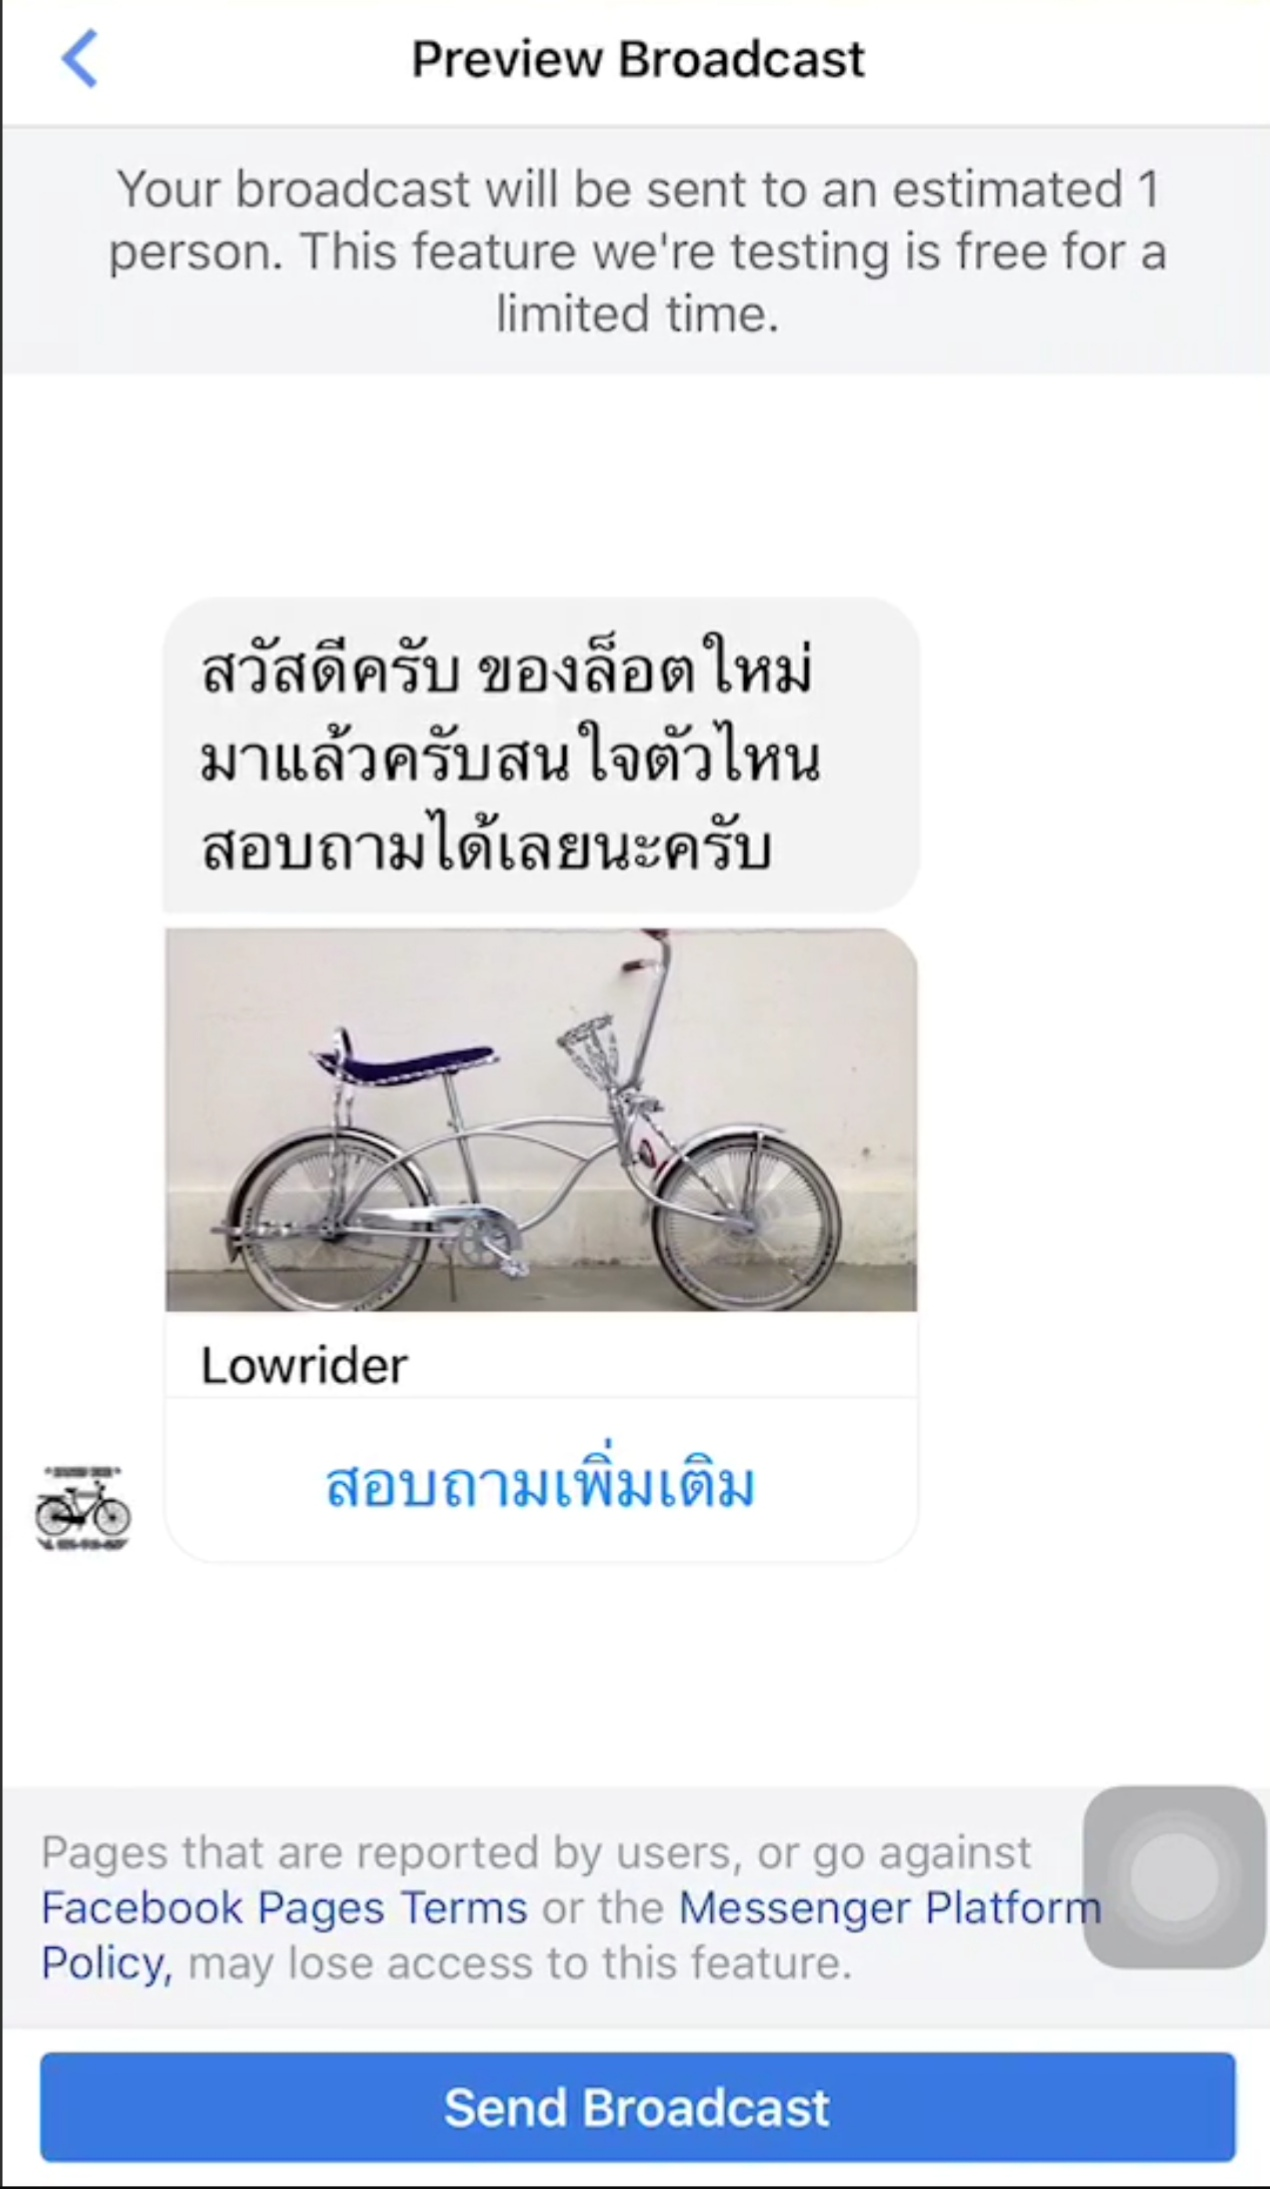 IMG_20180531_194845.jpg